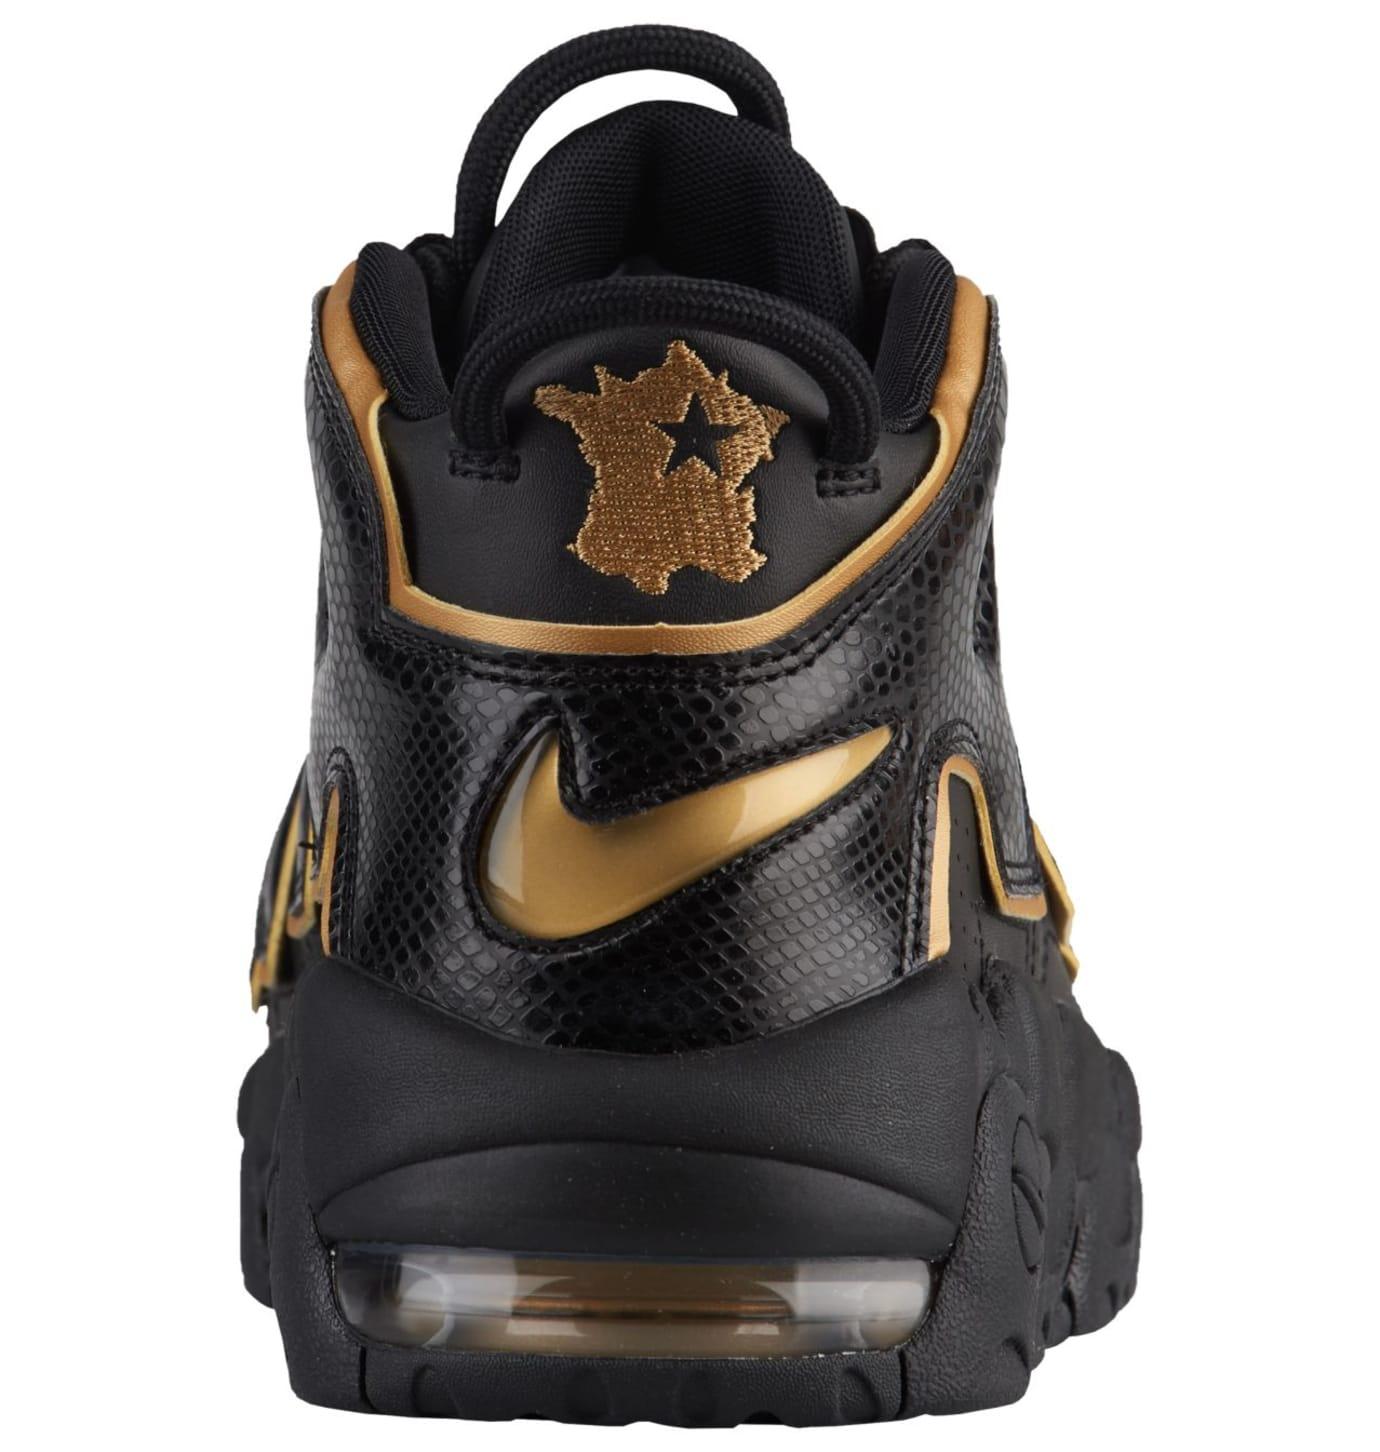 La oficina esposa inundar  Nike Air More Uptempo Black/Metallic Gold 'France' AV3810-001 Release Date    Sole Collector